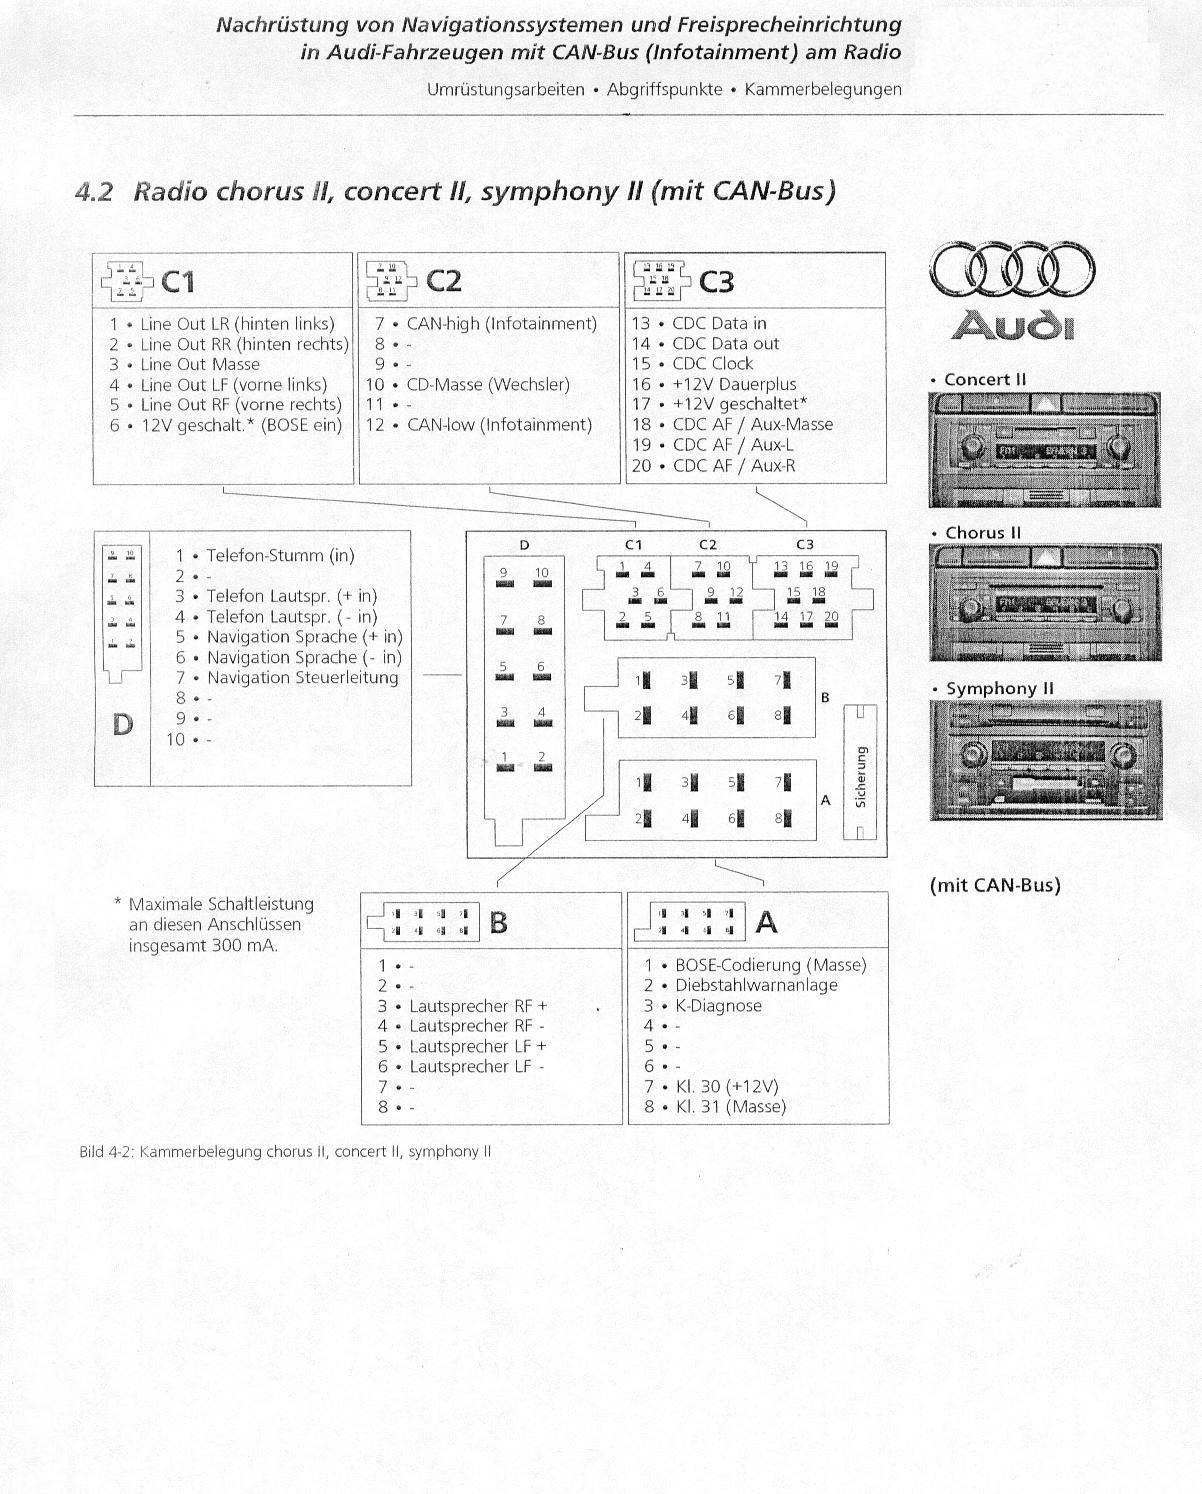 audi a6 4f wiring diagram guitar diagrams 2 humbucker 3 way toggle switch 8e b6 batterie entlädt sich